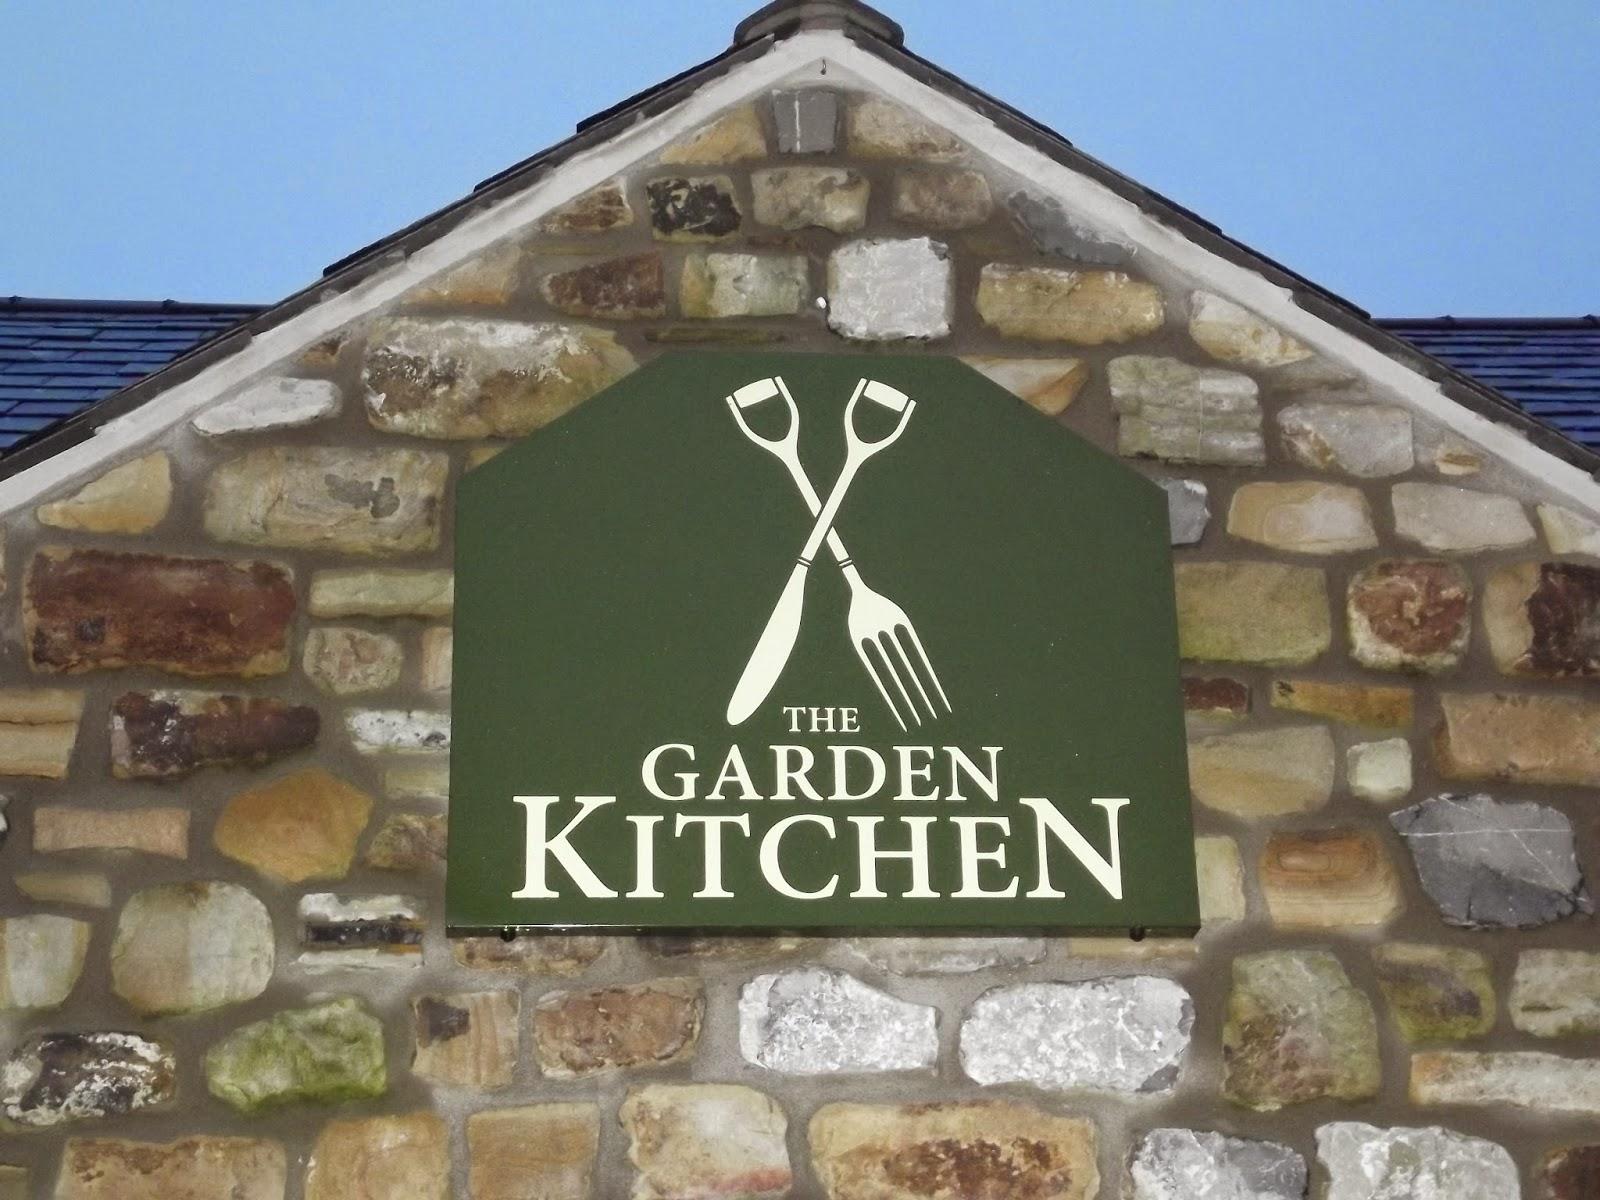 The Garden Kitchen A Visit To The Garden Kitchen Clitheroe Sarahs Style Statement